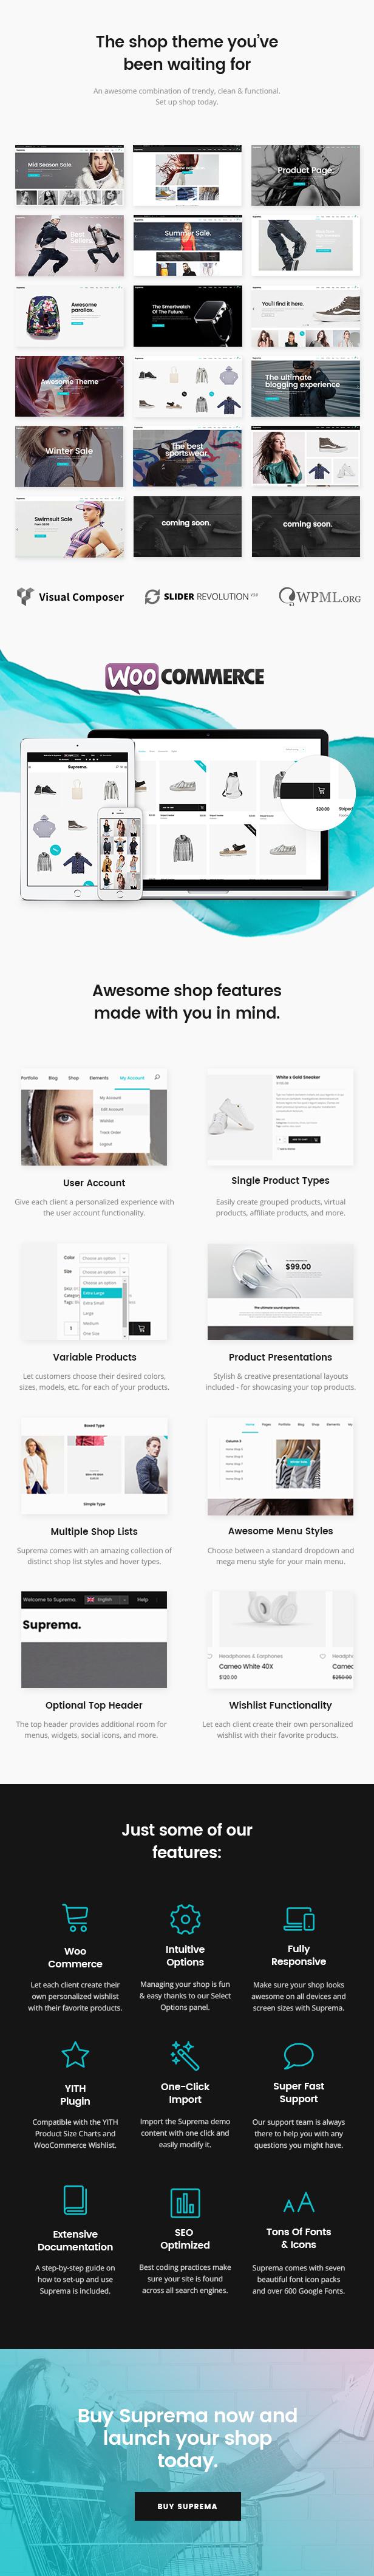 Suprema - Multipurpose eCommerce Theme - 1